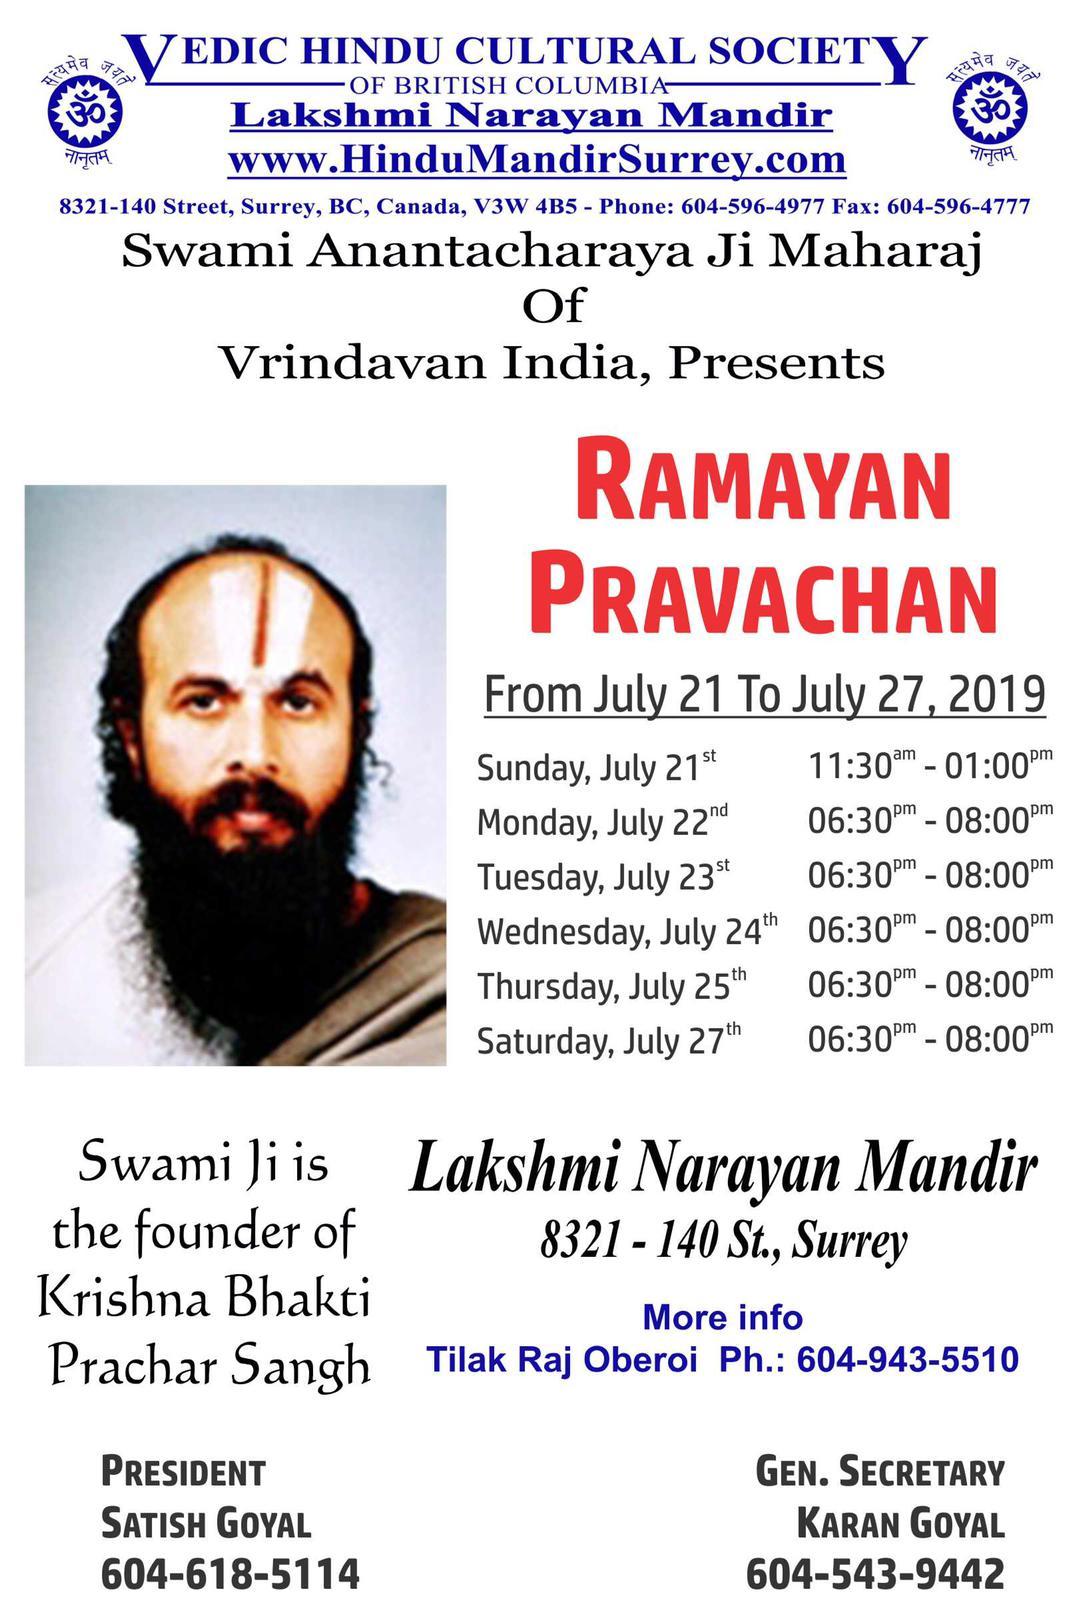 Ramayan Pravachan  by Swami Anantacharaya Ji